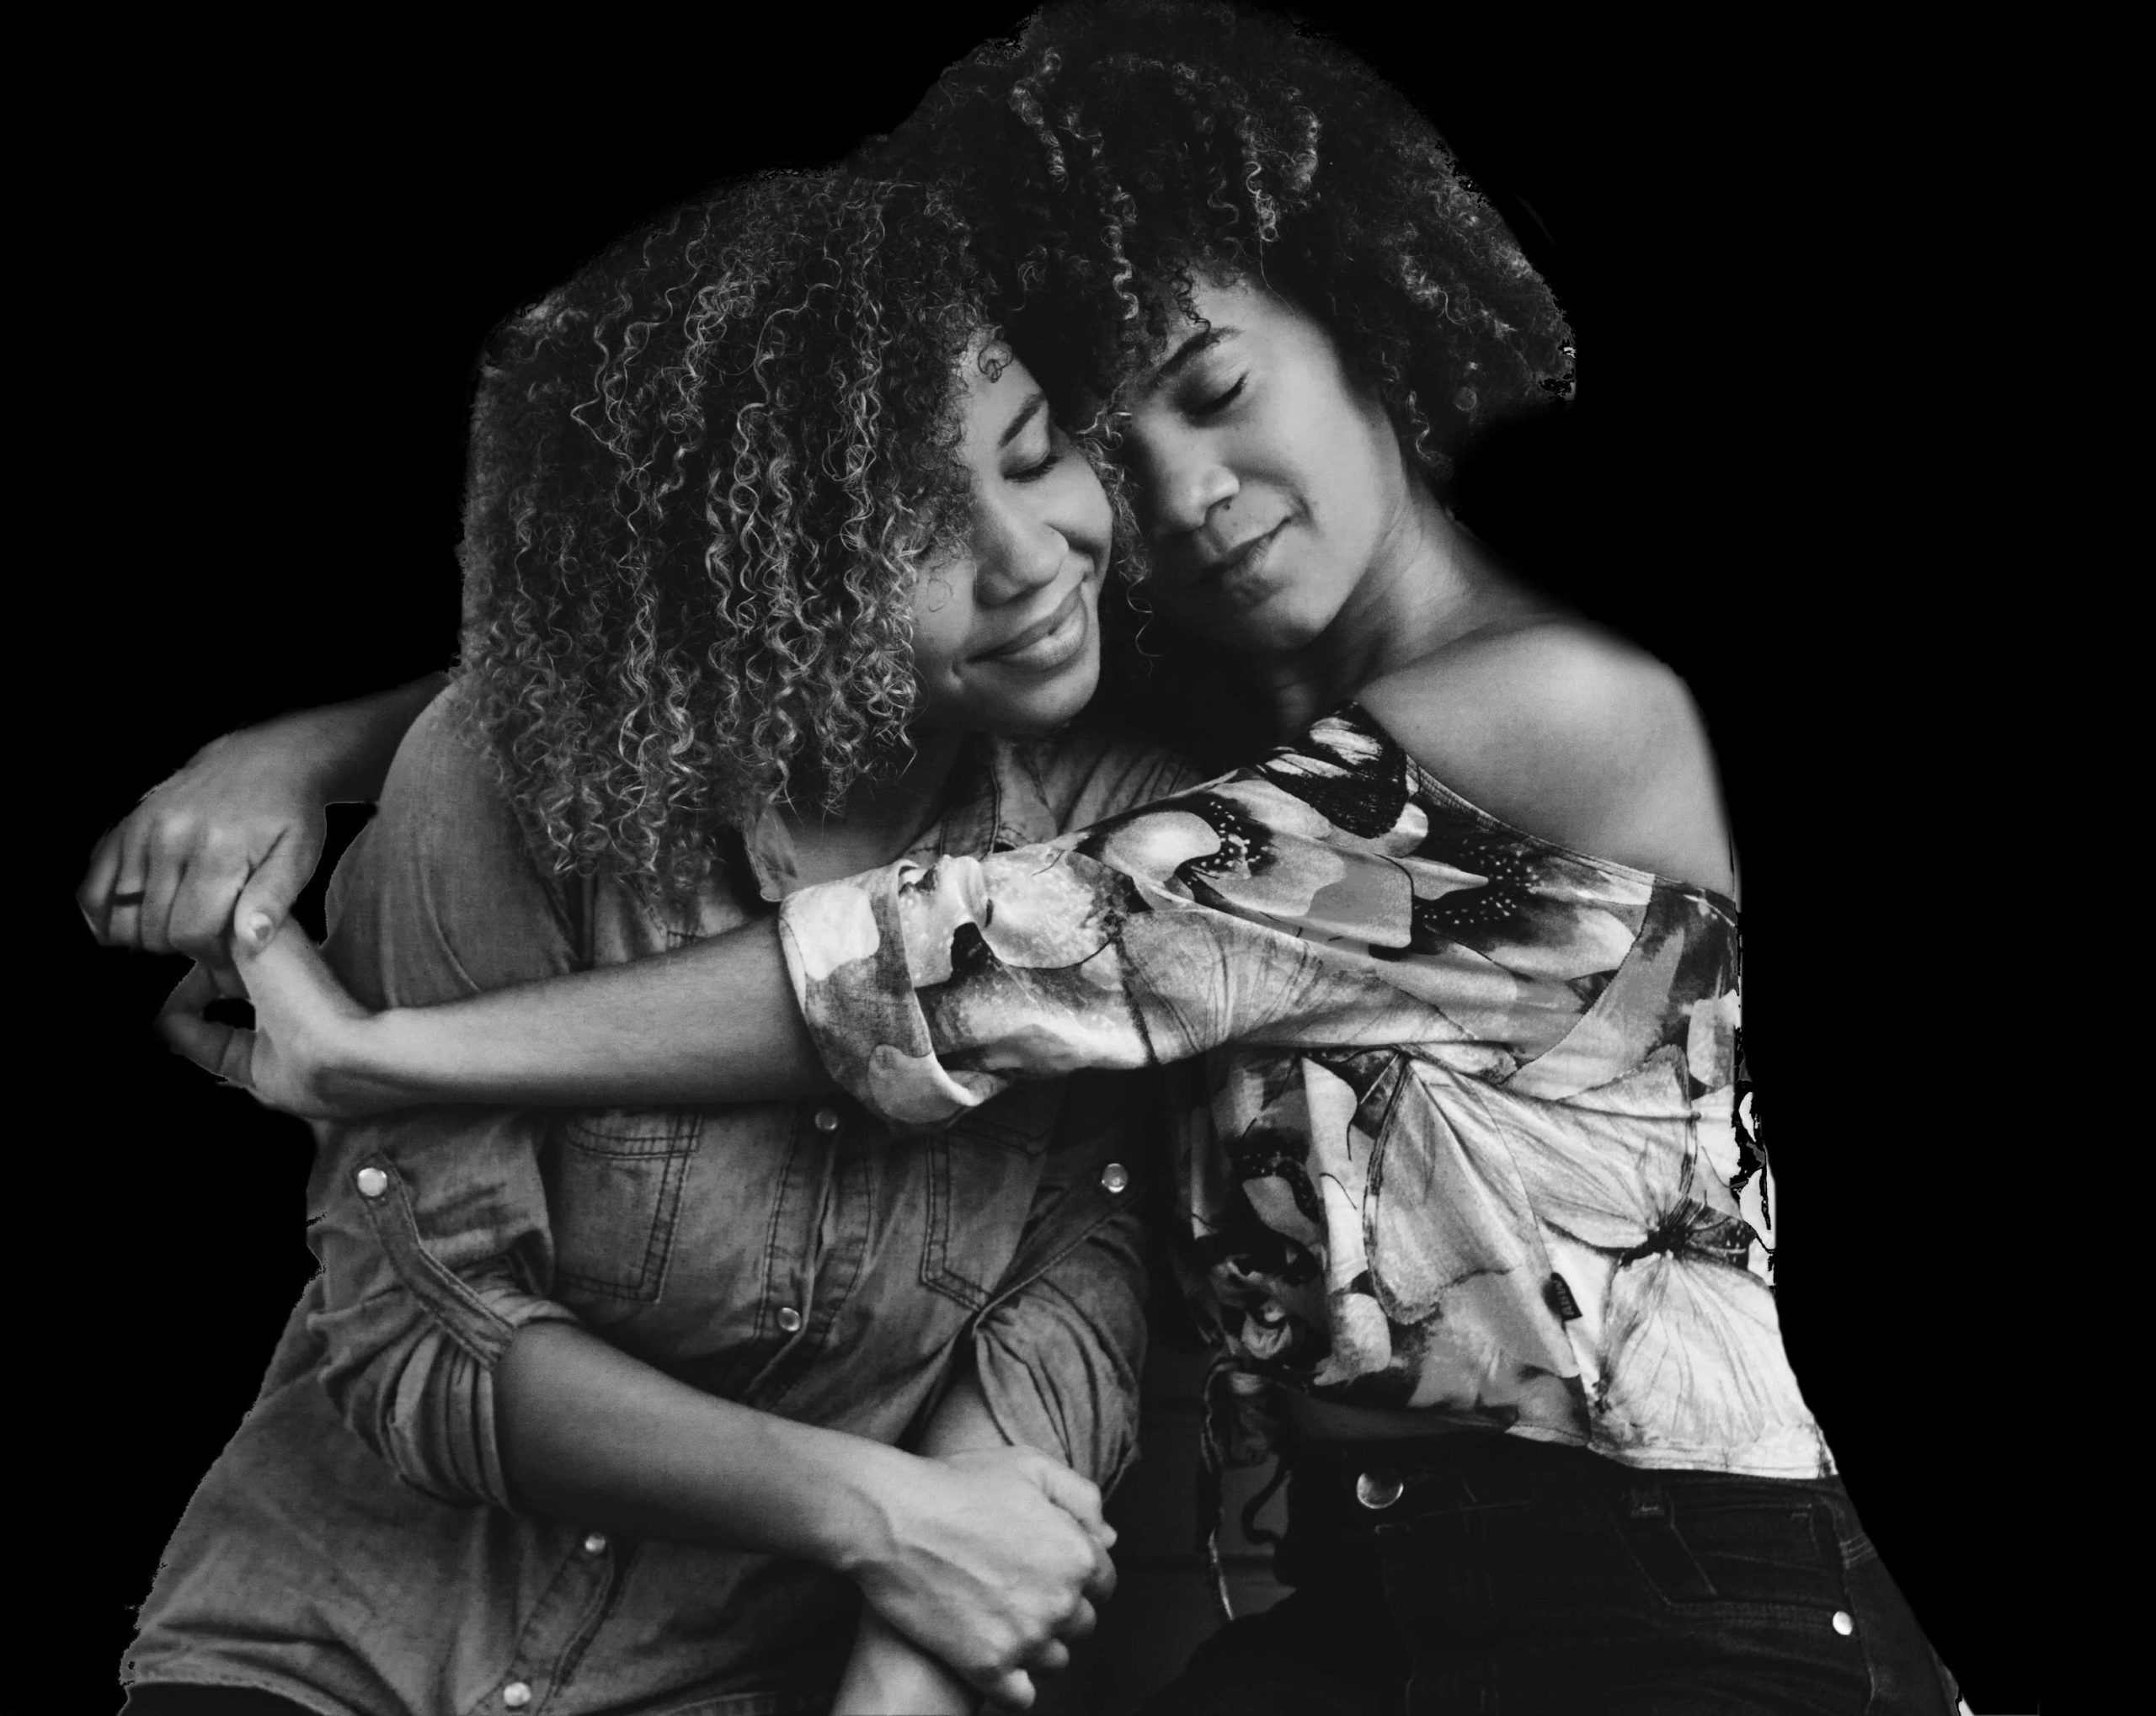 two Black girls embracing